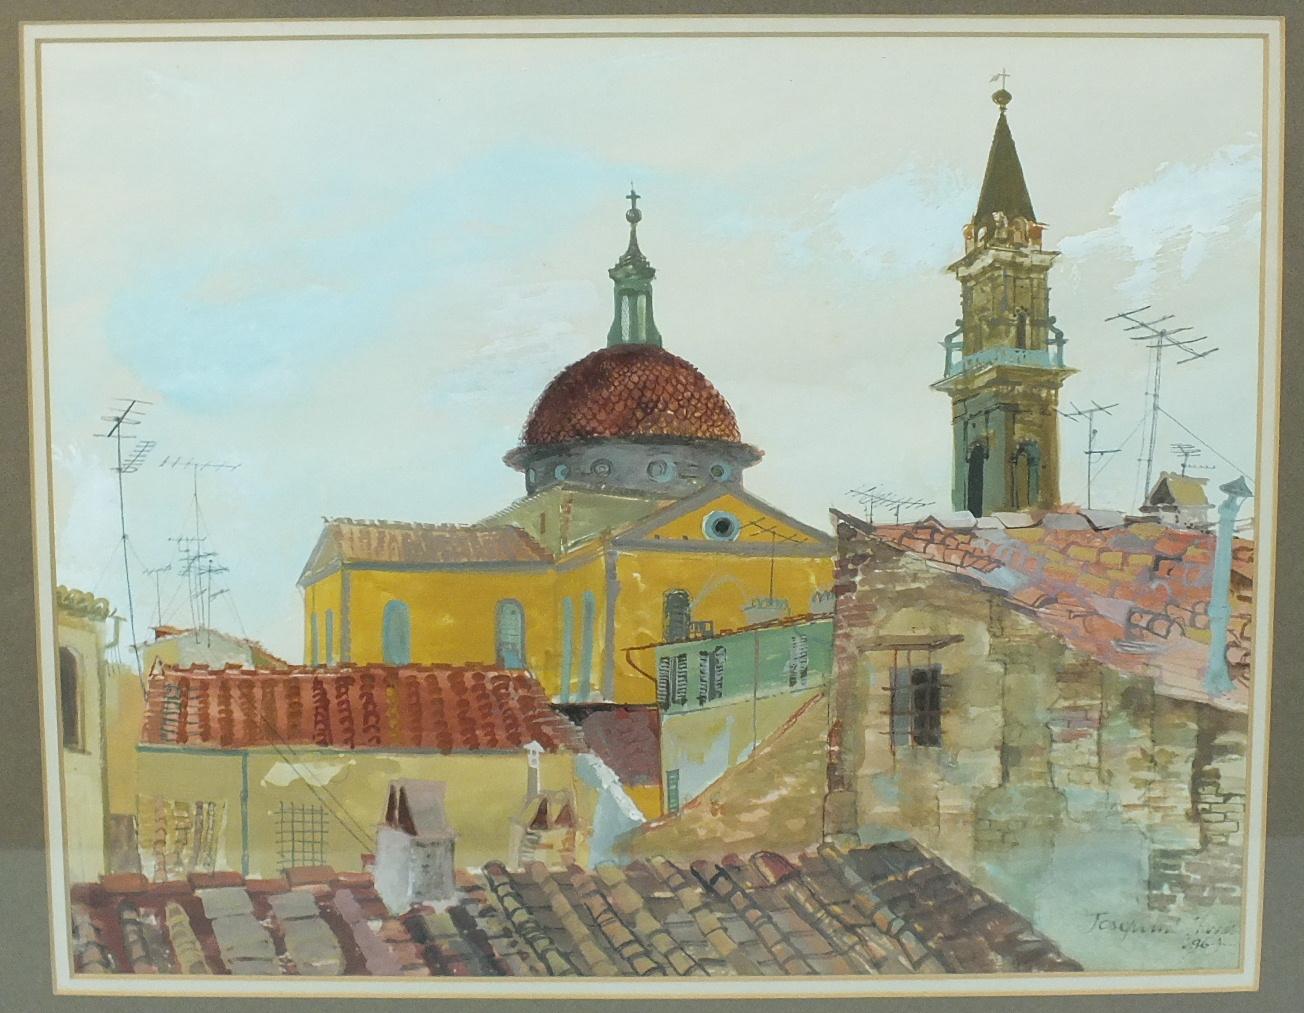 Lot 66 - •Josephine Hams (b. 1931) SANTA SPIRITO, FLORENCE Signed watercolour, dated 1964, 33 x 41cm,